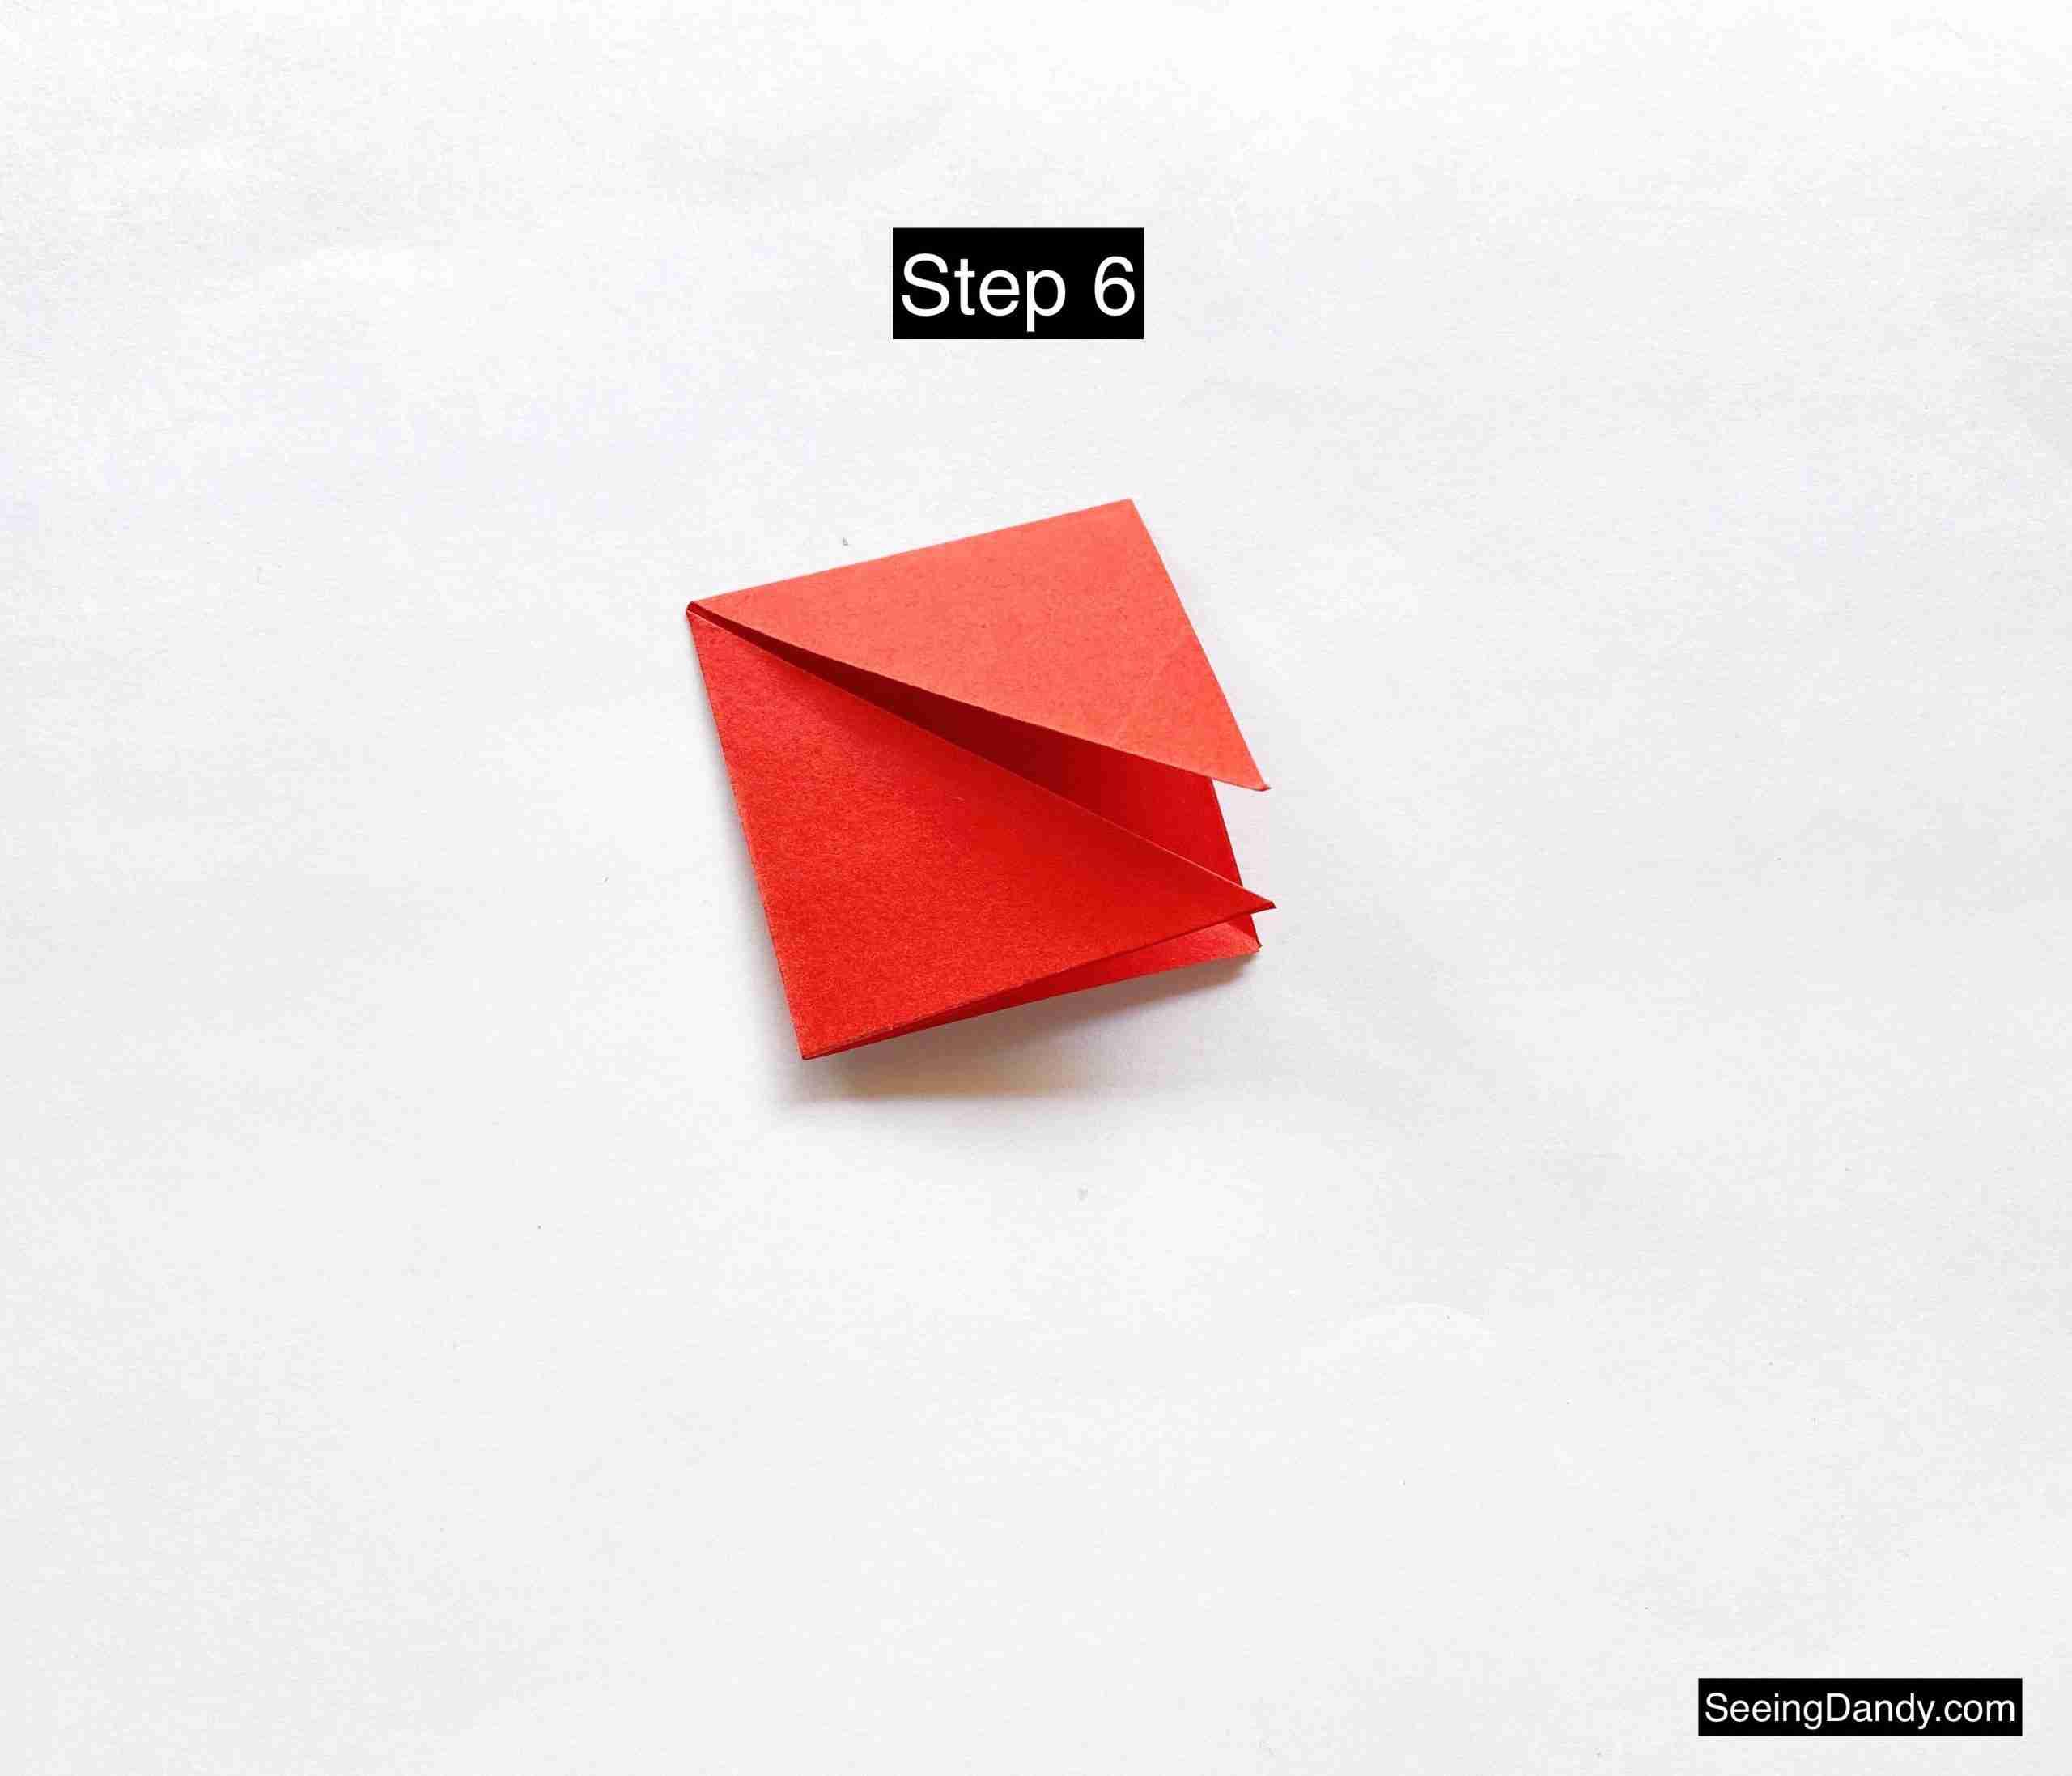 valentine origami, japanese paper folding, paper crafts, valentine card, valentine ideas, easy crafts, diy crafting, school party ideas, valentine party, red paper